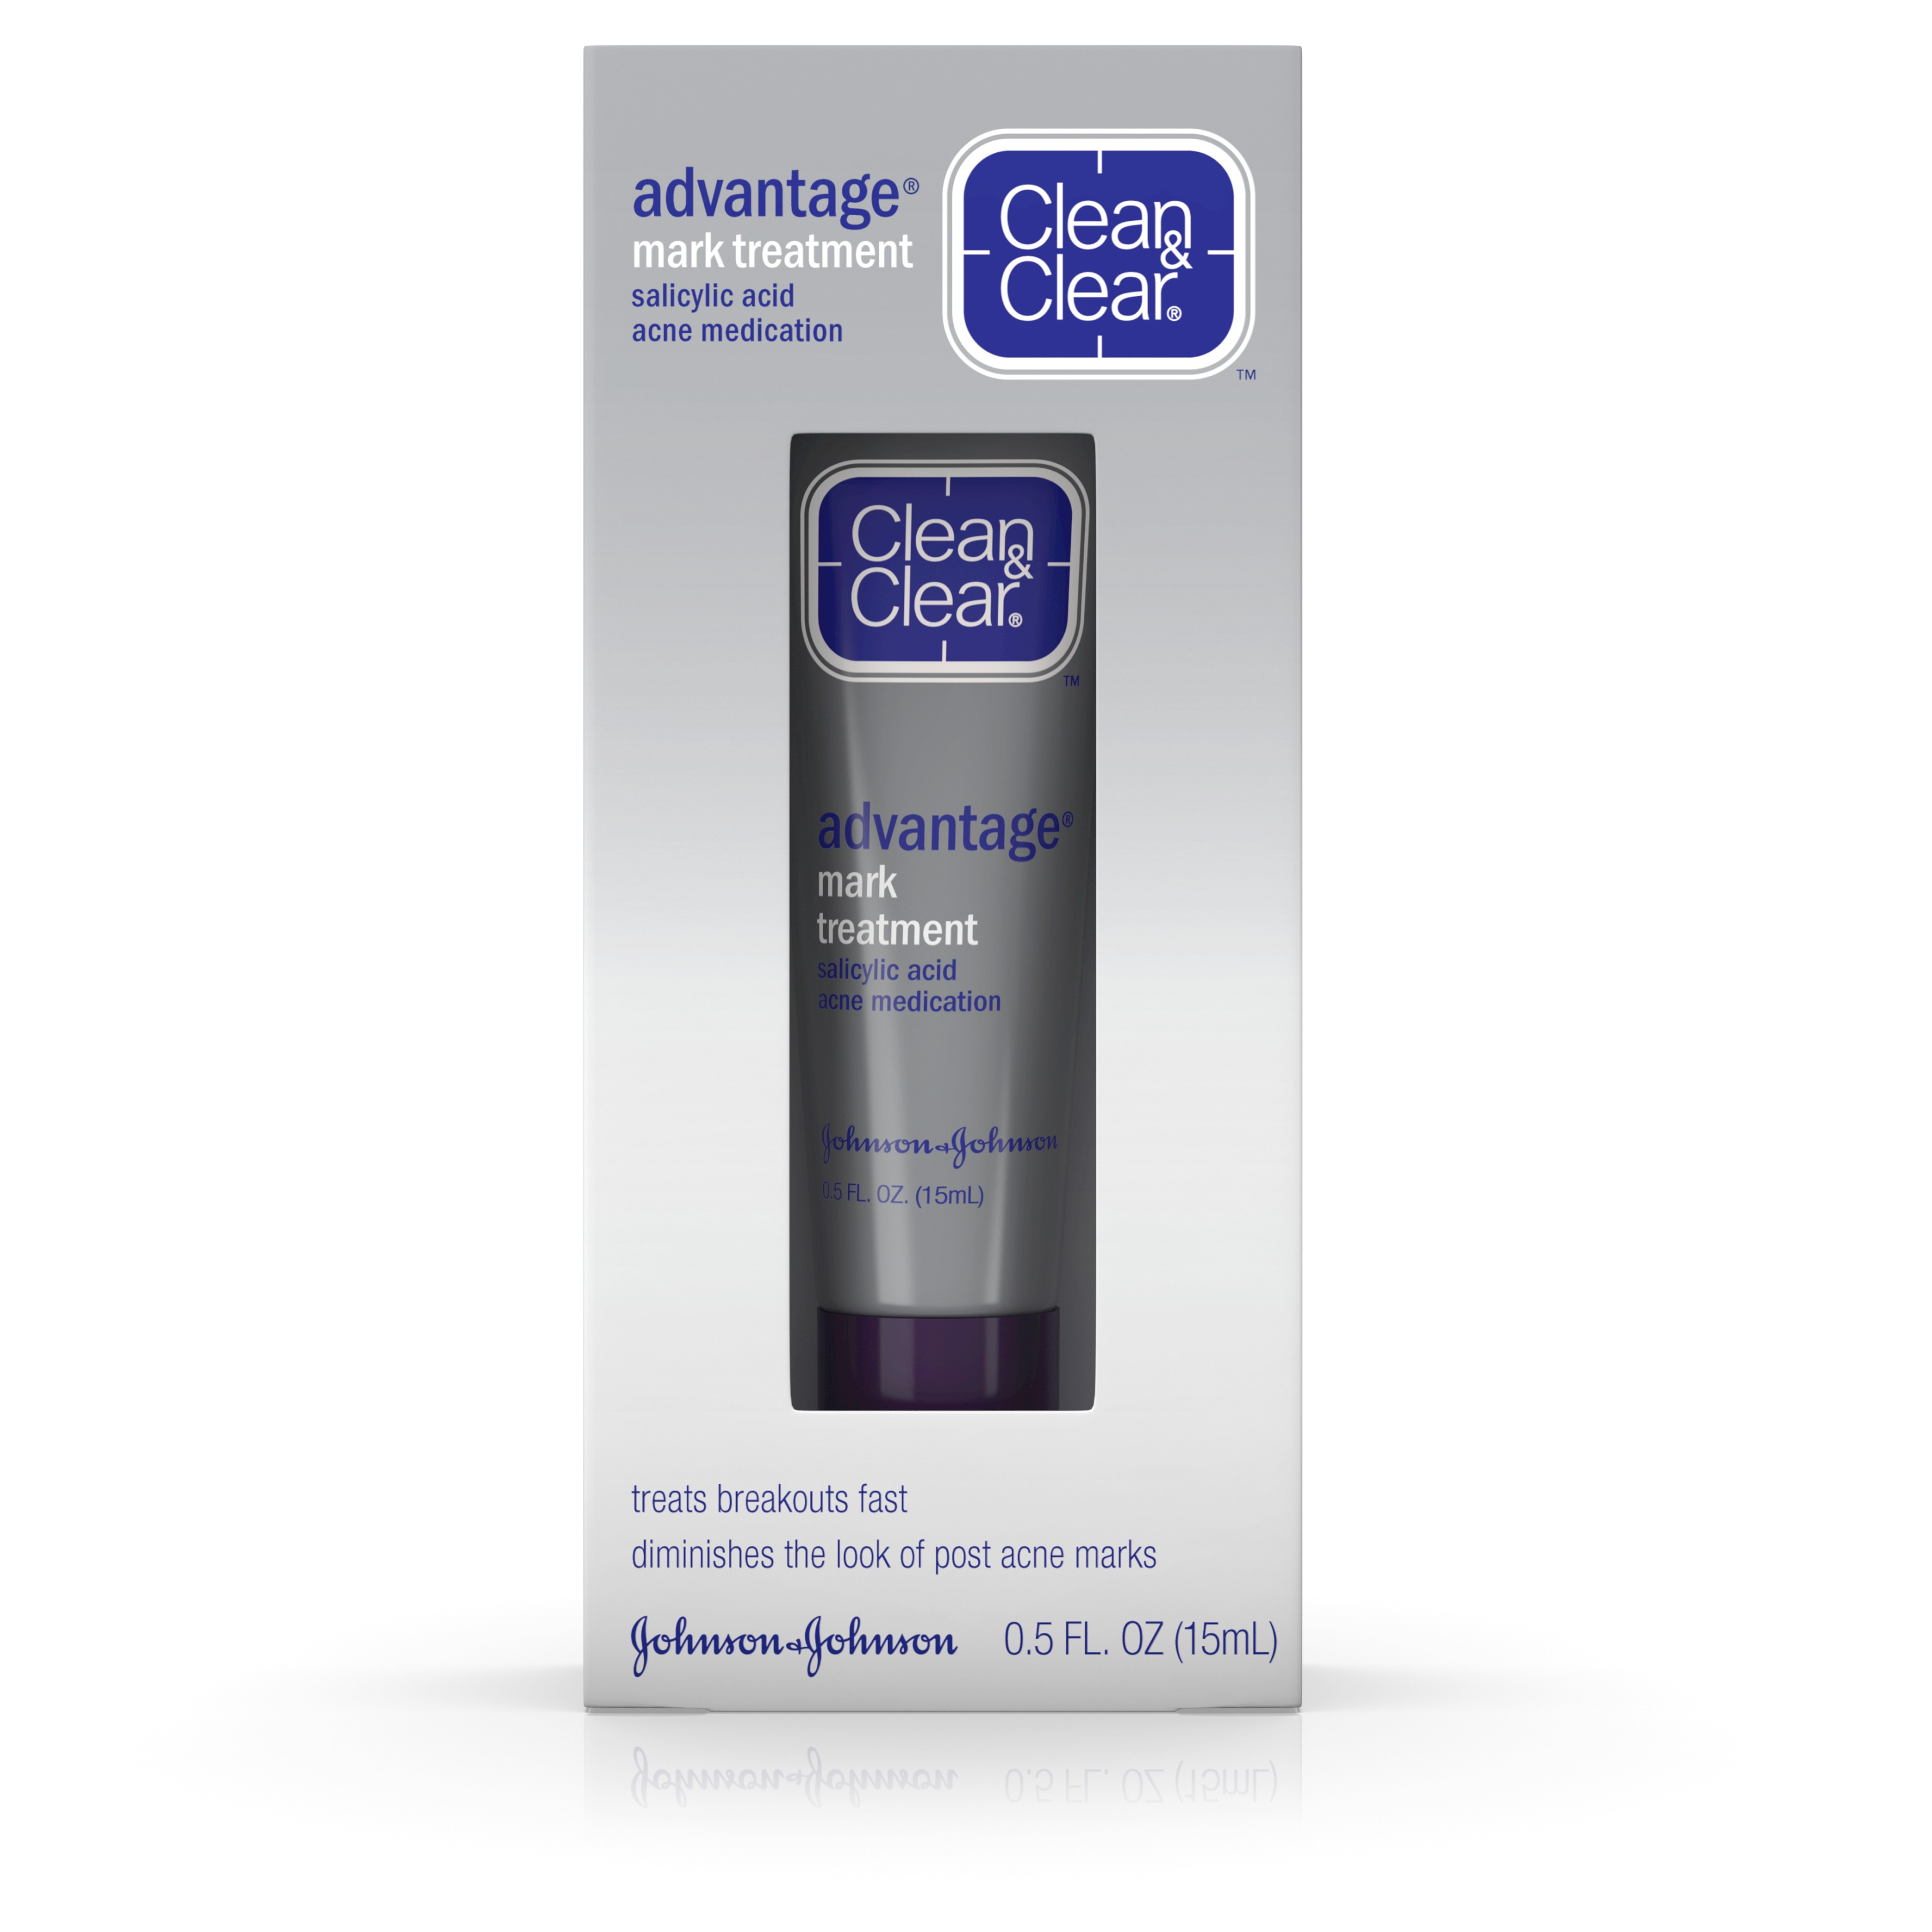 Clean & Clear Advantage Acne Mark Treatment with Salicylic Acid.5 oz